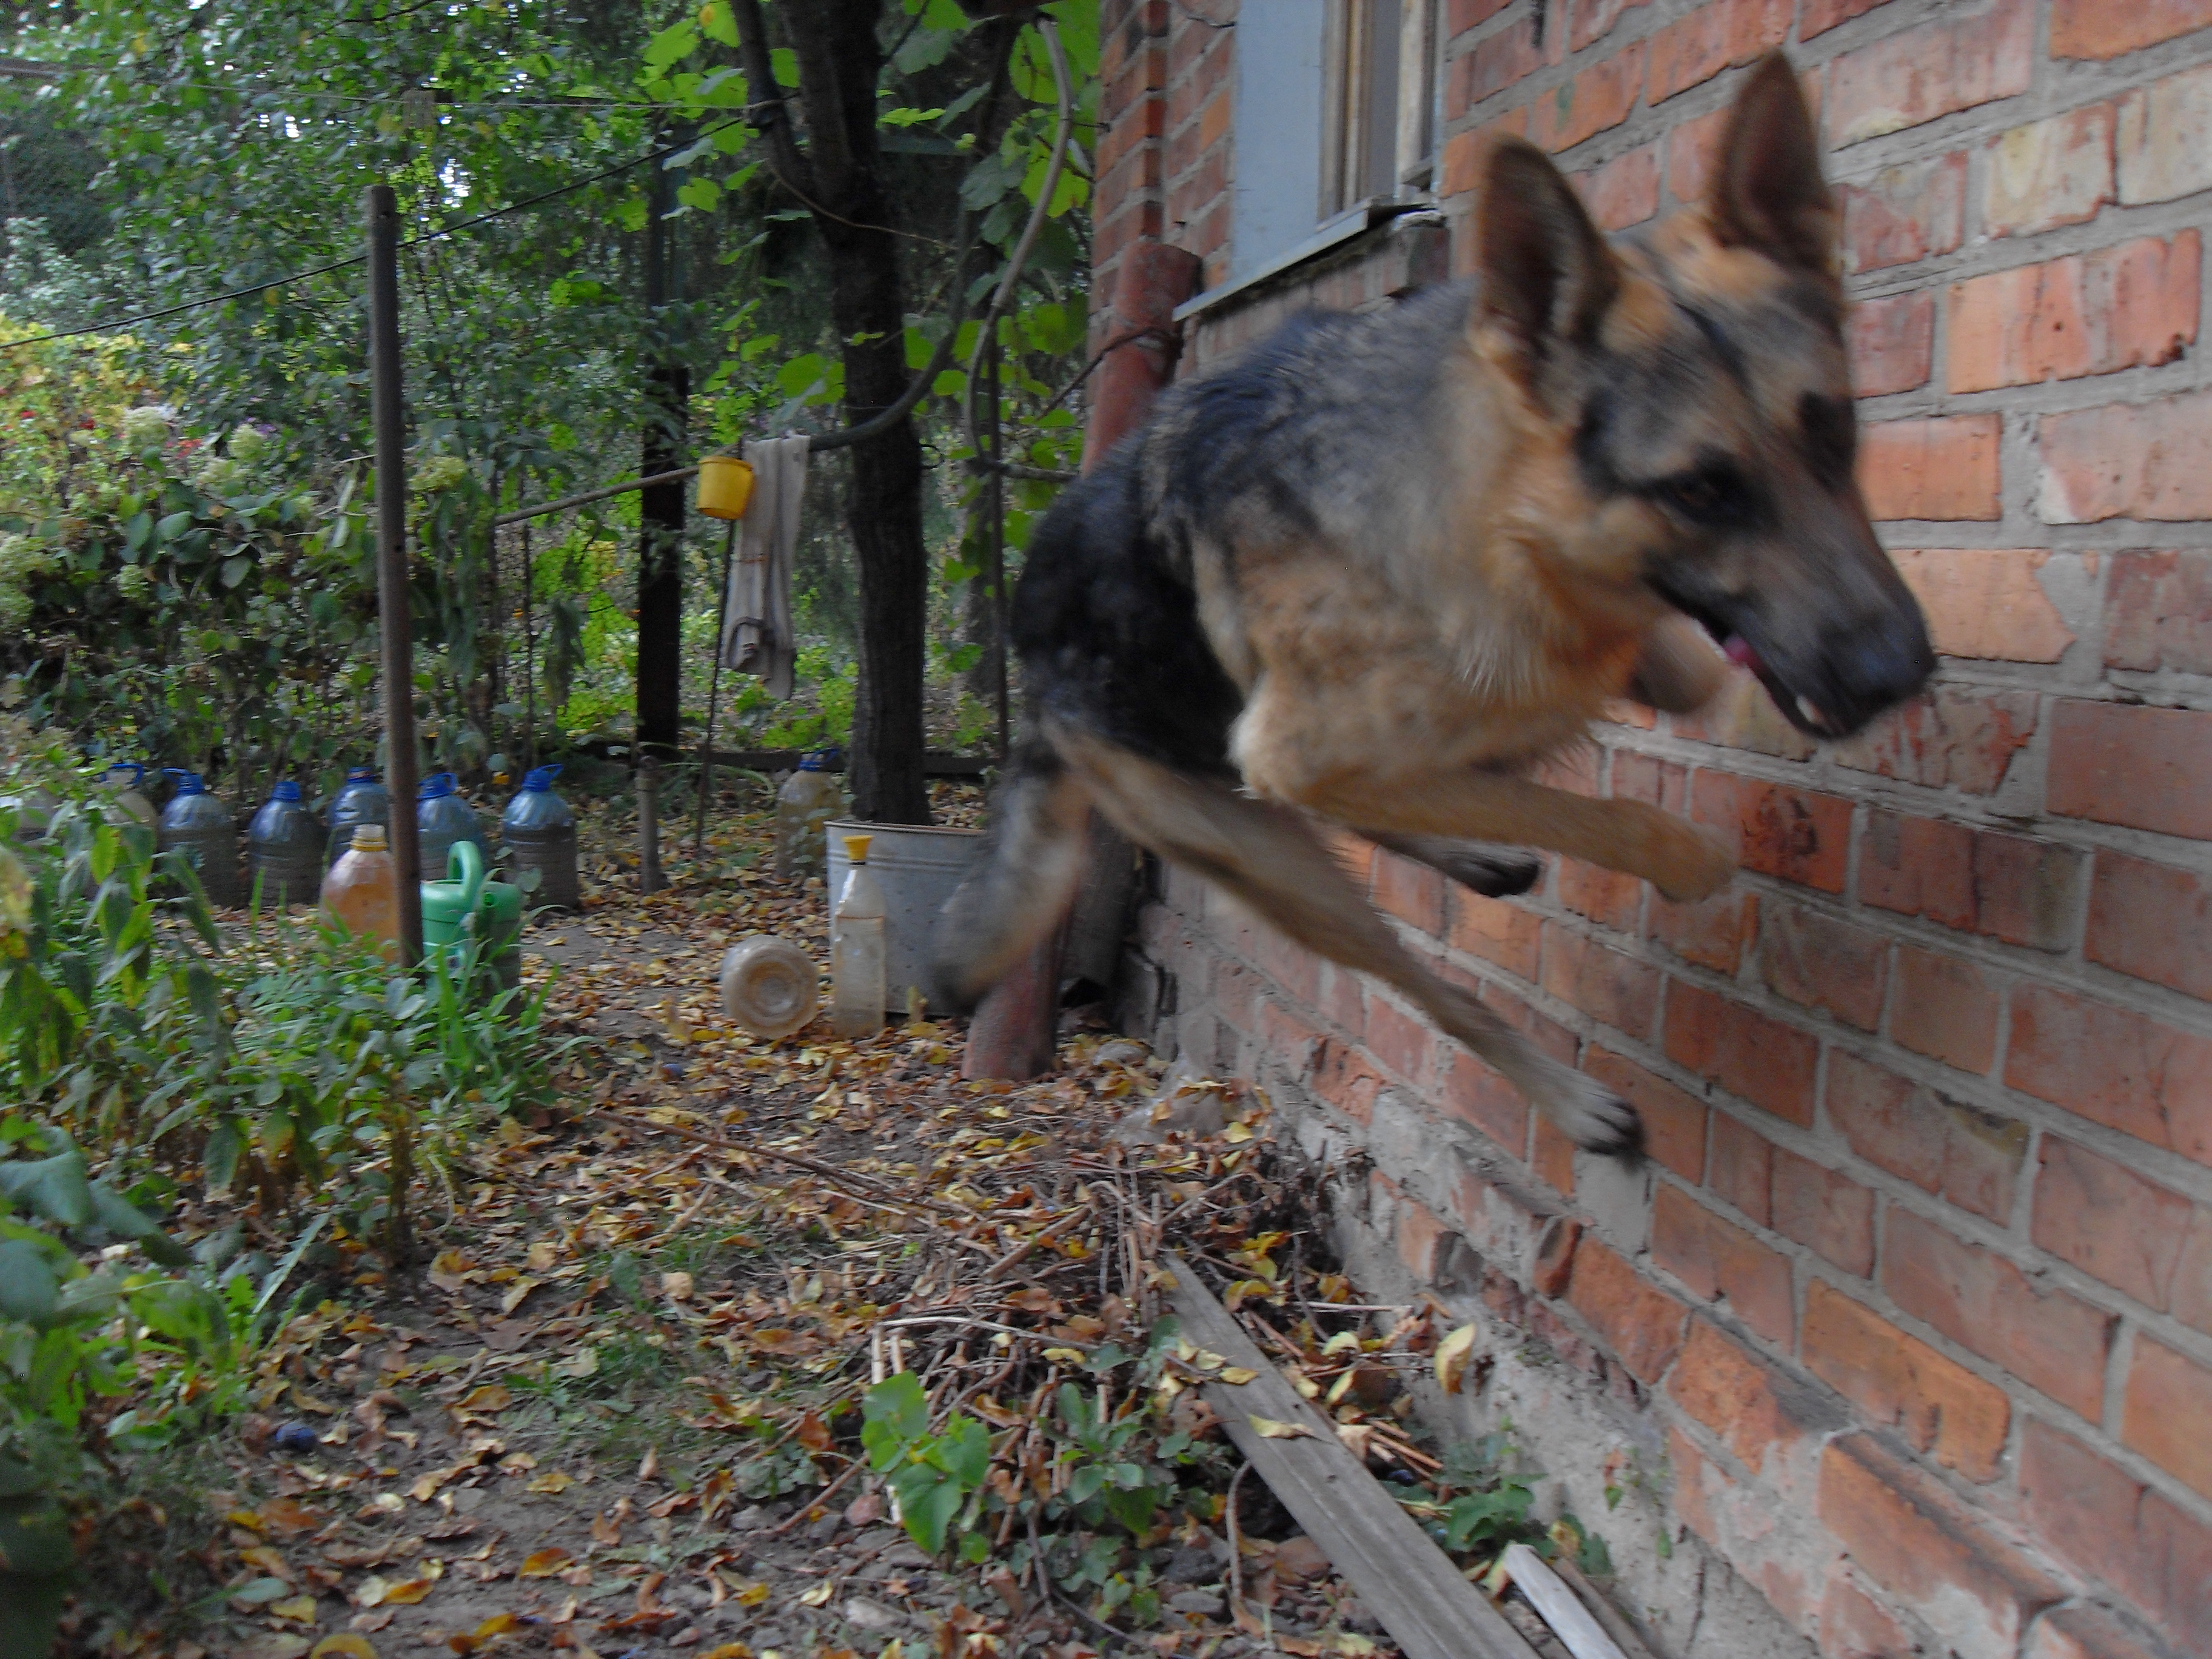 Jumping East-European Shepherd dog wallpaper